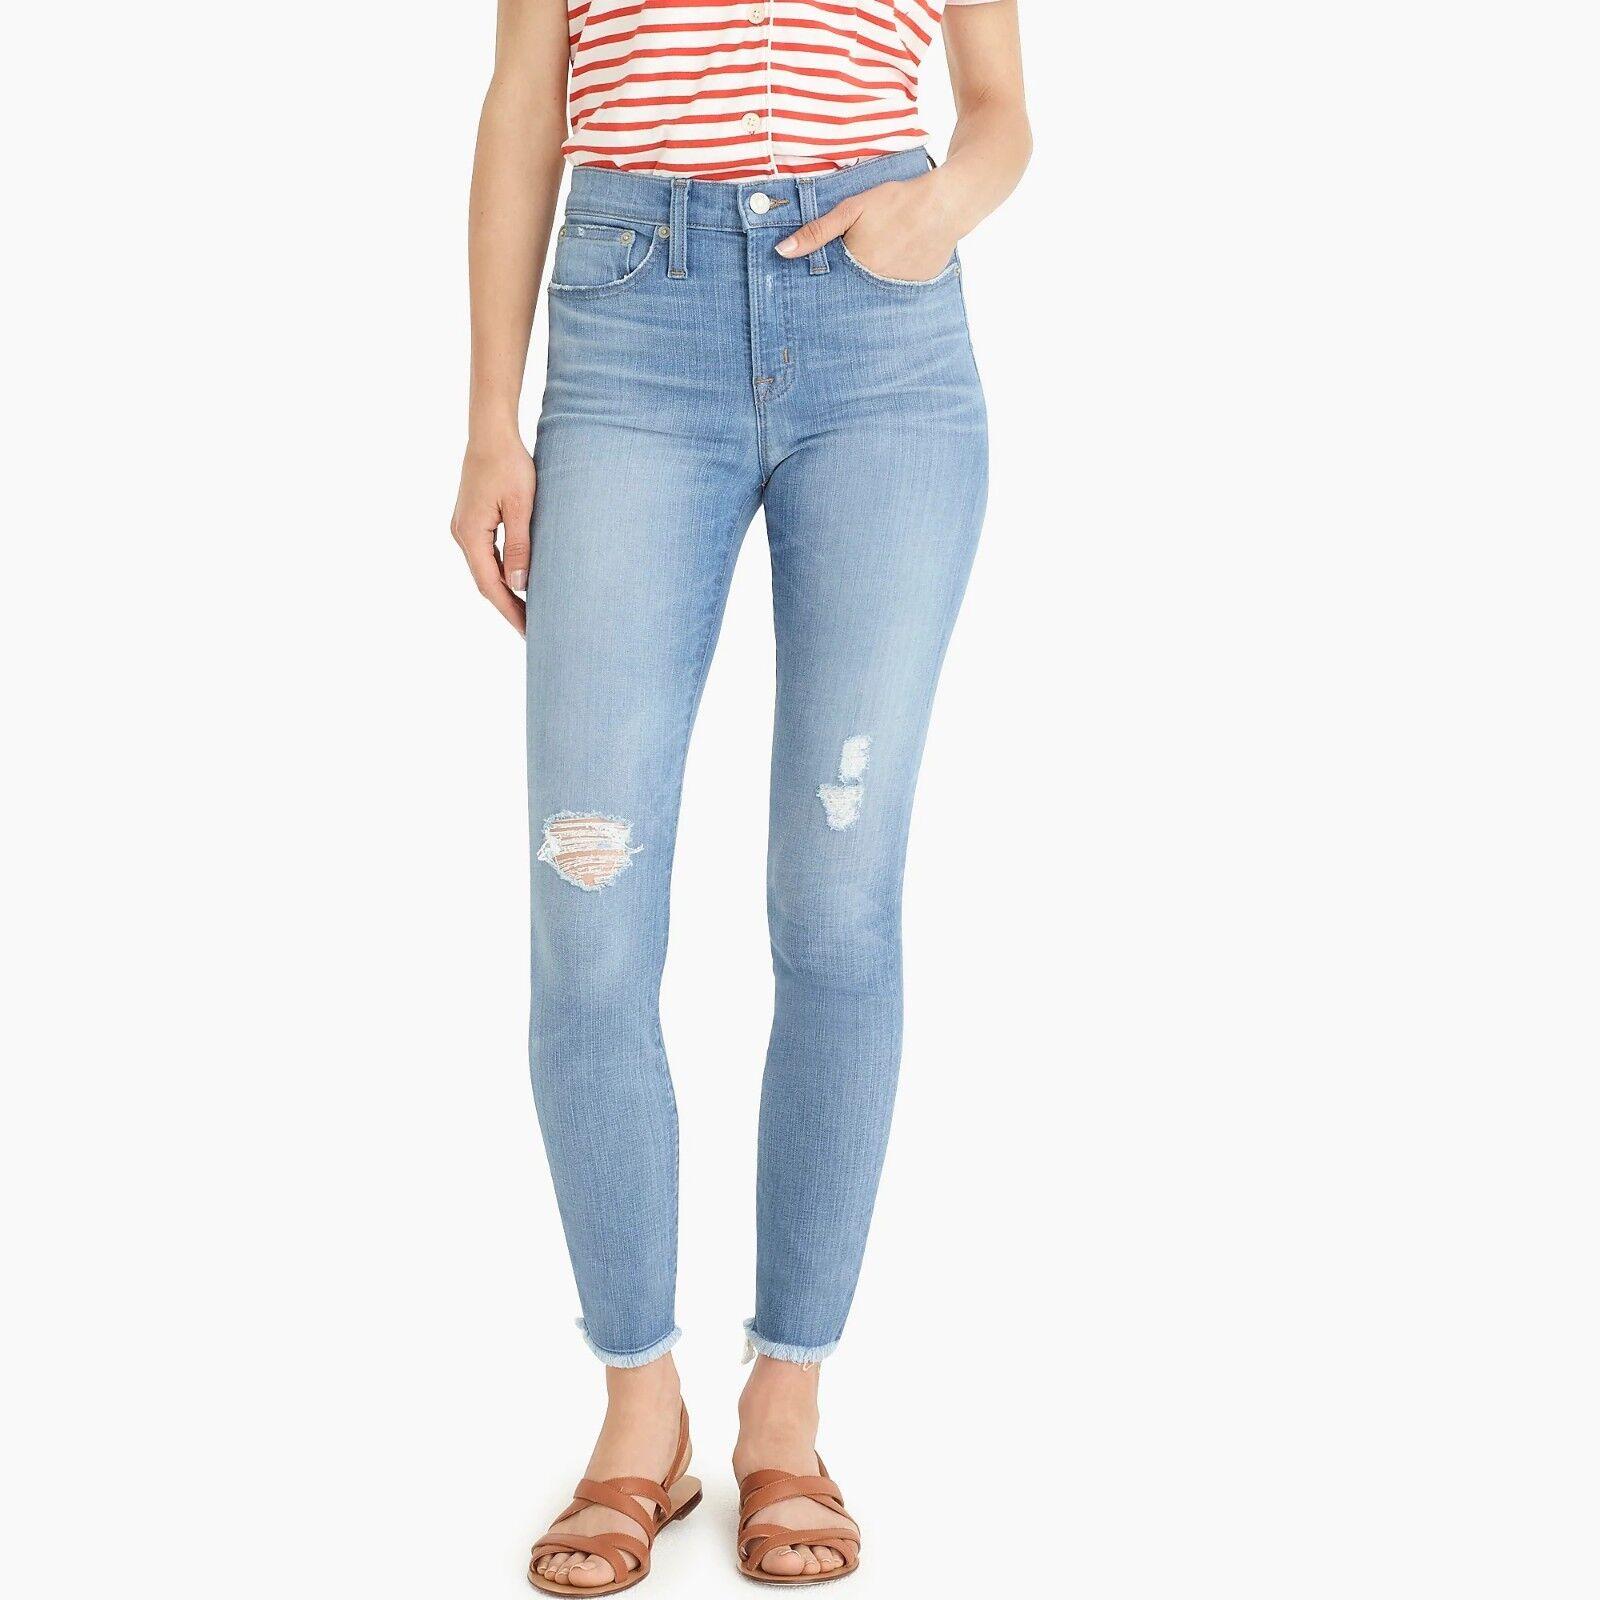 J. Crew Women's Tall 9  High-Rise Skinny Jean in Light bluee w  Raw Hems - T31